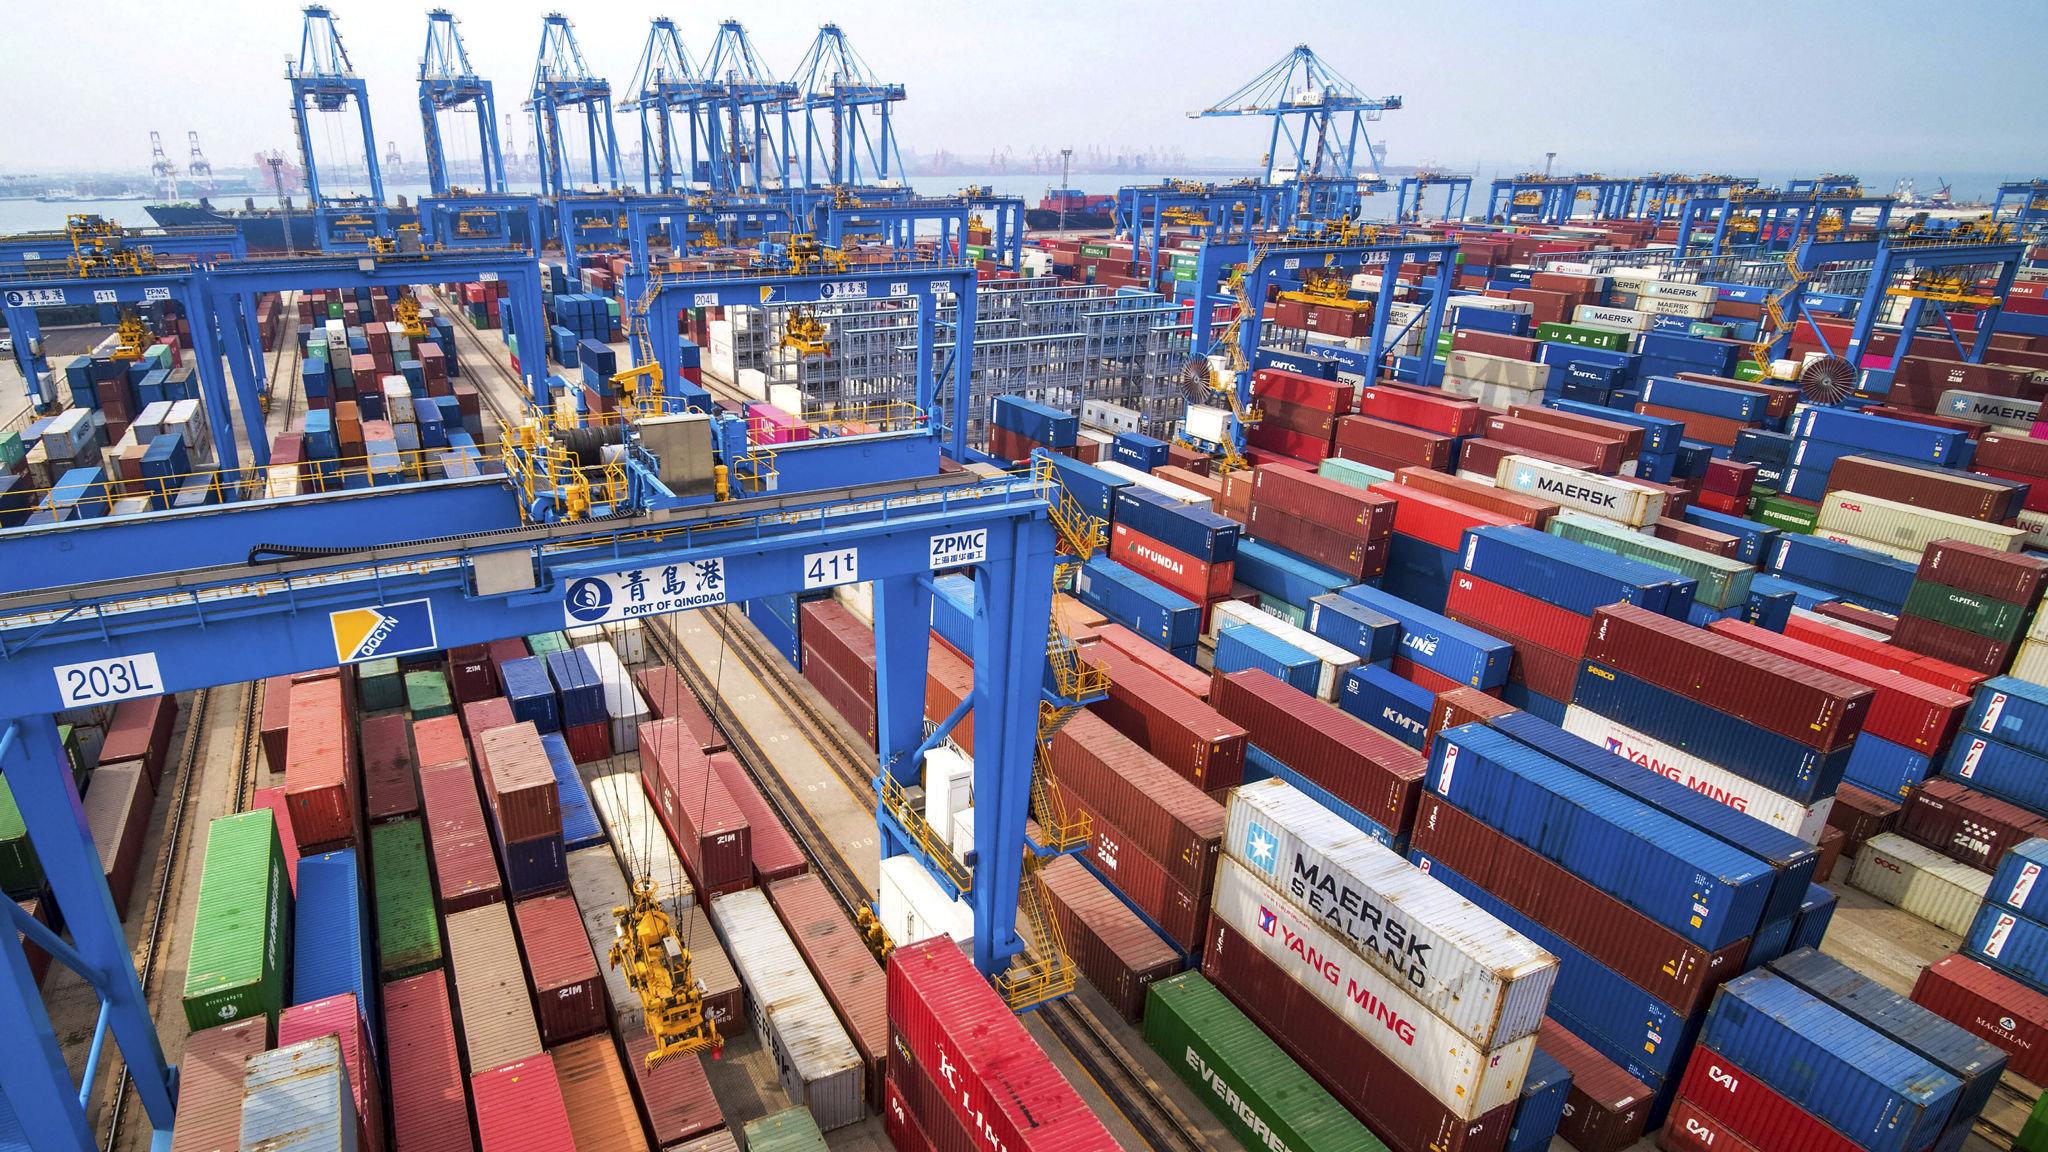 Why investors should temper optimism of a China trade rally